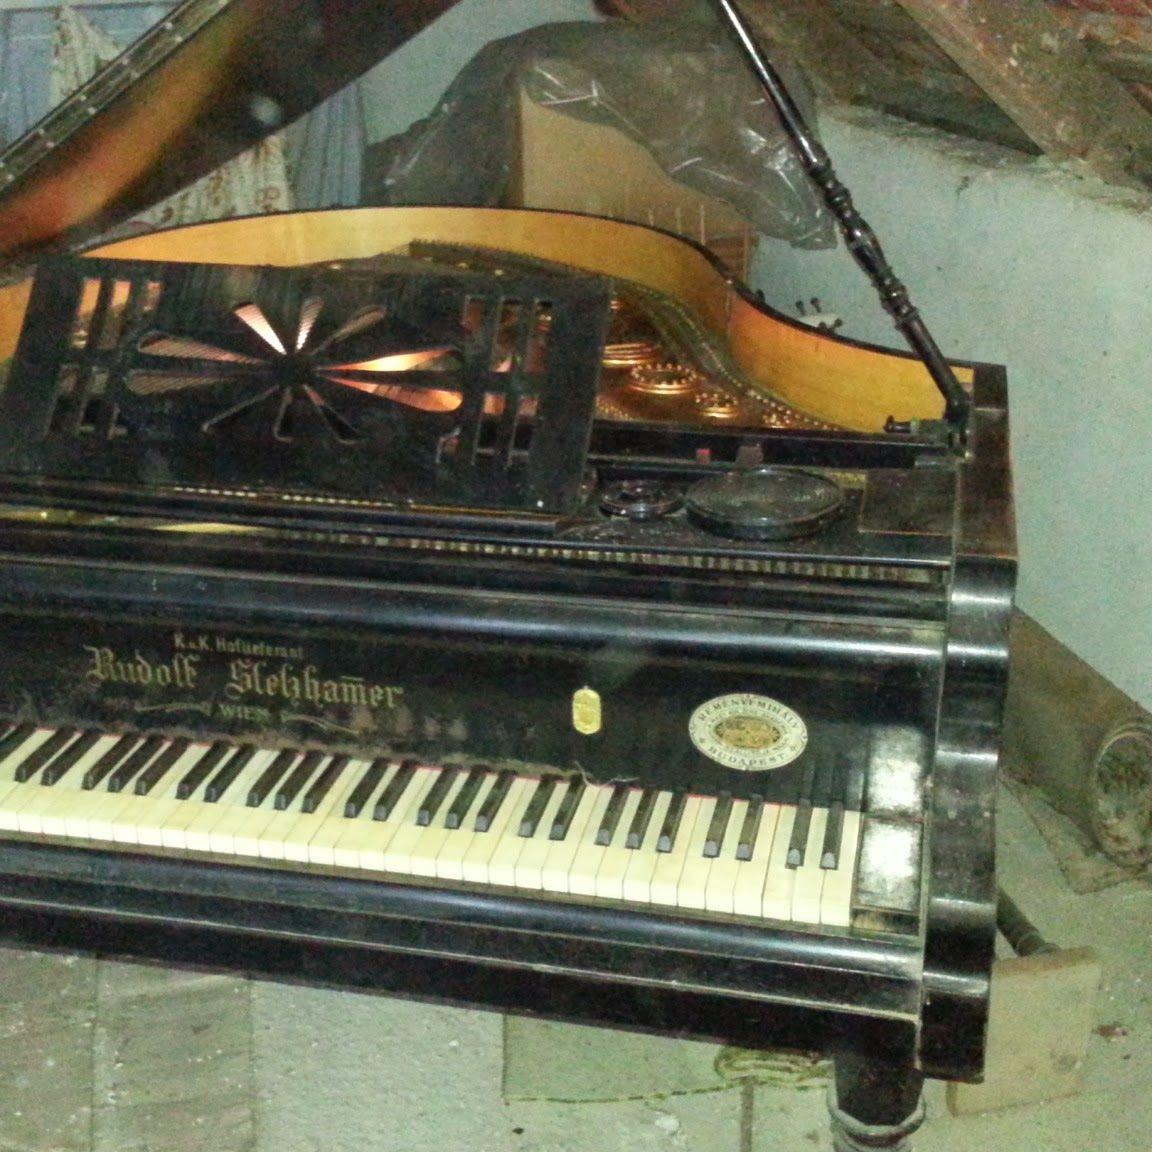 Starožitný klavír Rudolf Stekhamer z Uhorska